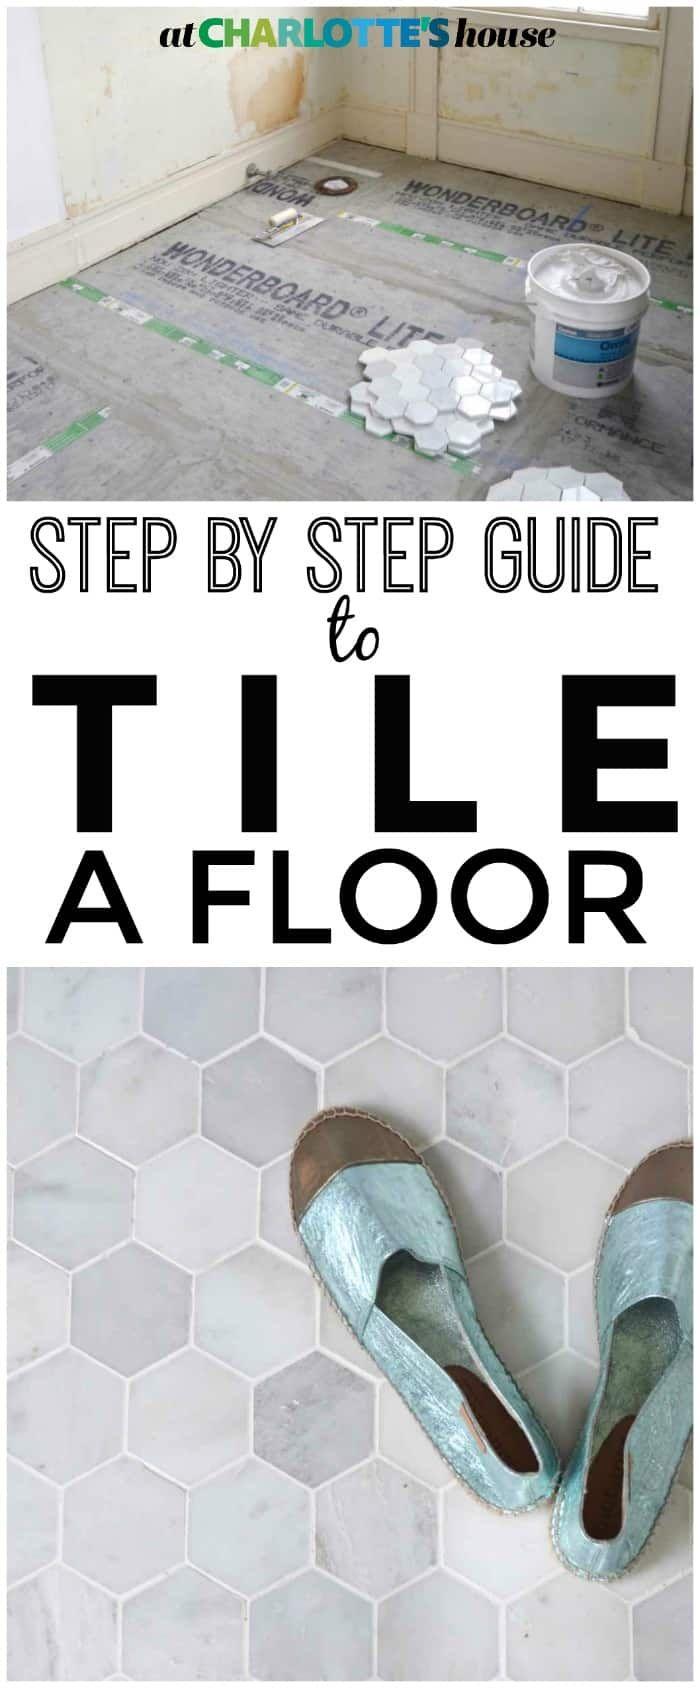 How to Prep and Tile a Floor | Tile floor diy, Diy ...